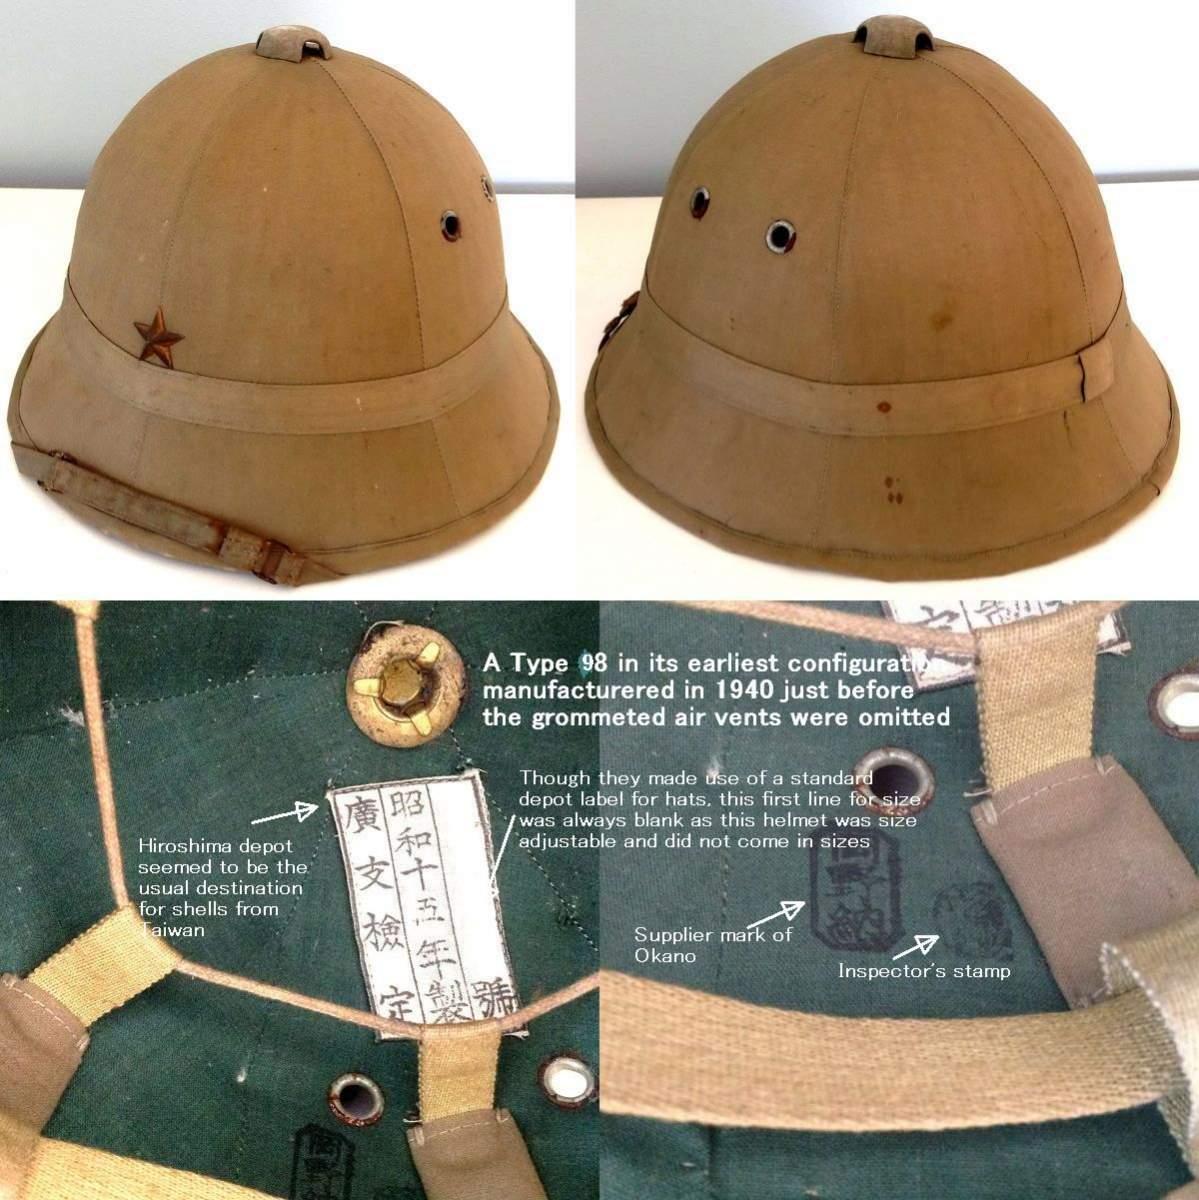 aa6e7aa6306 The Evolution of the Japanese Imperial Army Sun Helmet (1915-1945)